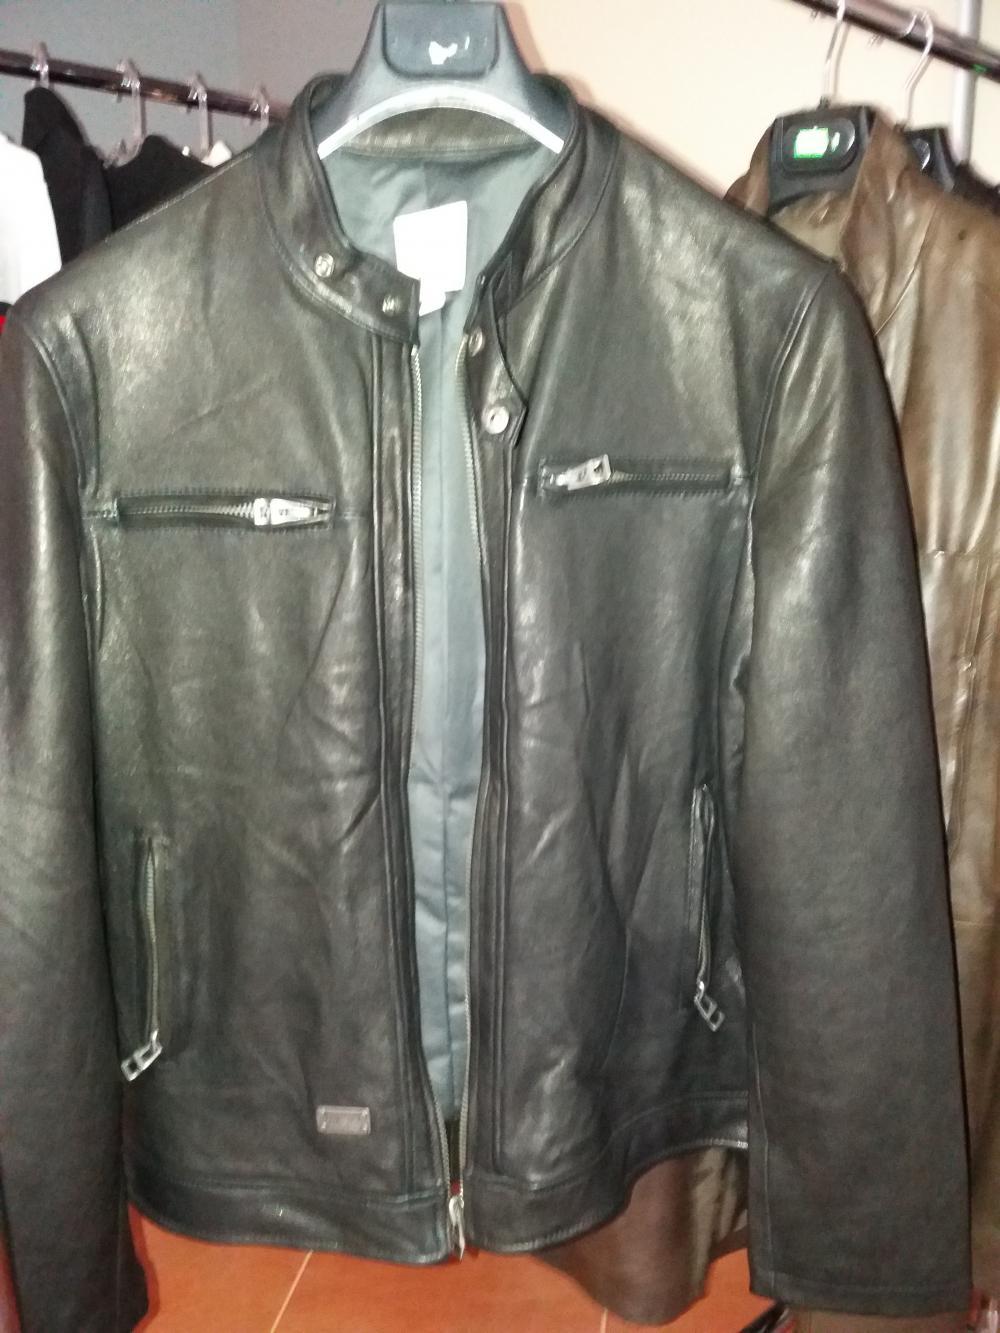 b8fdc58dddc Мотоциклетная кожаная куртка Diesel-480